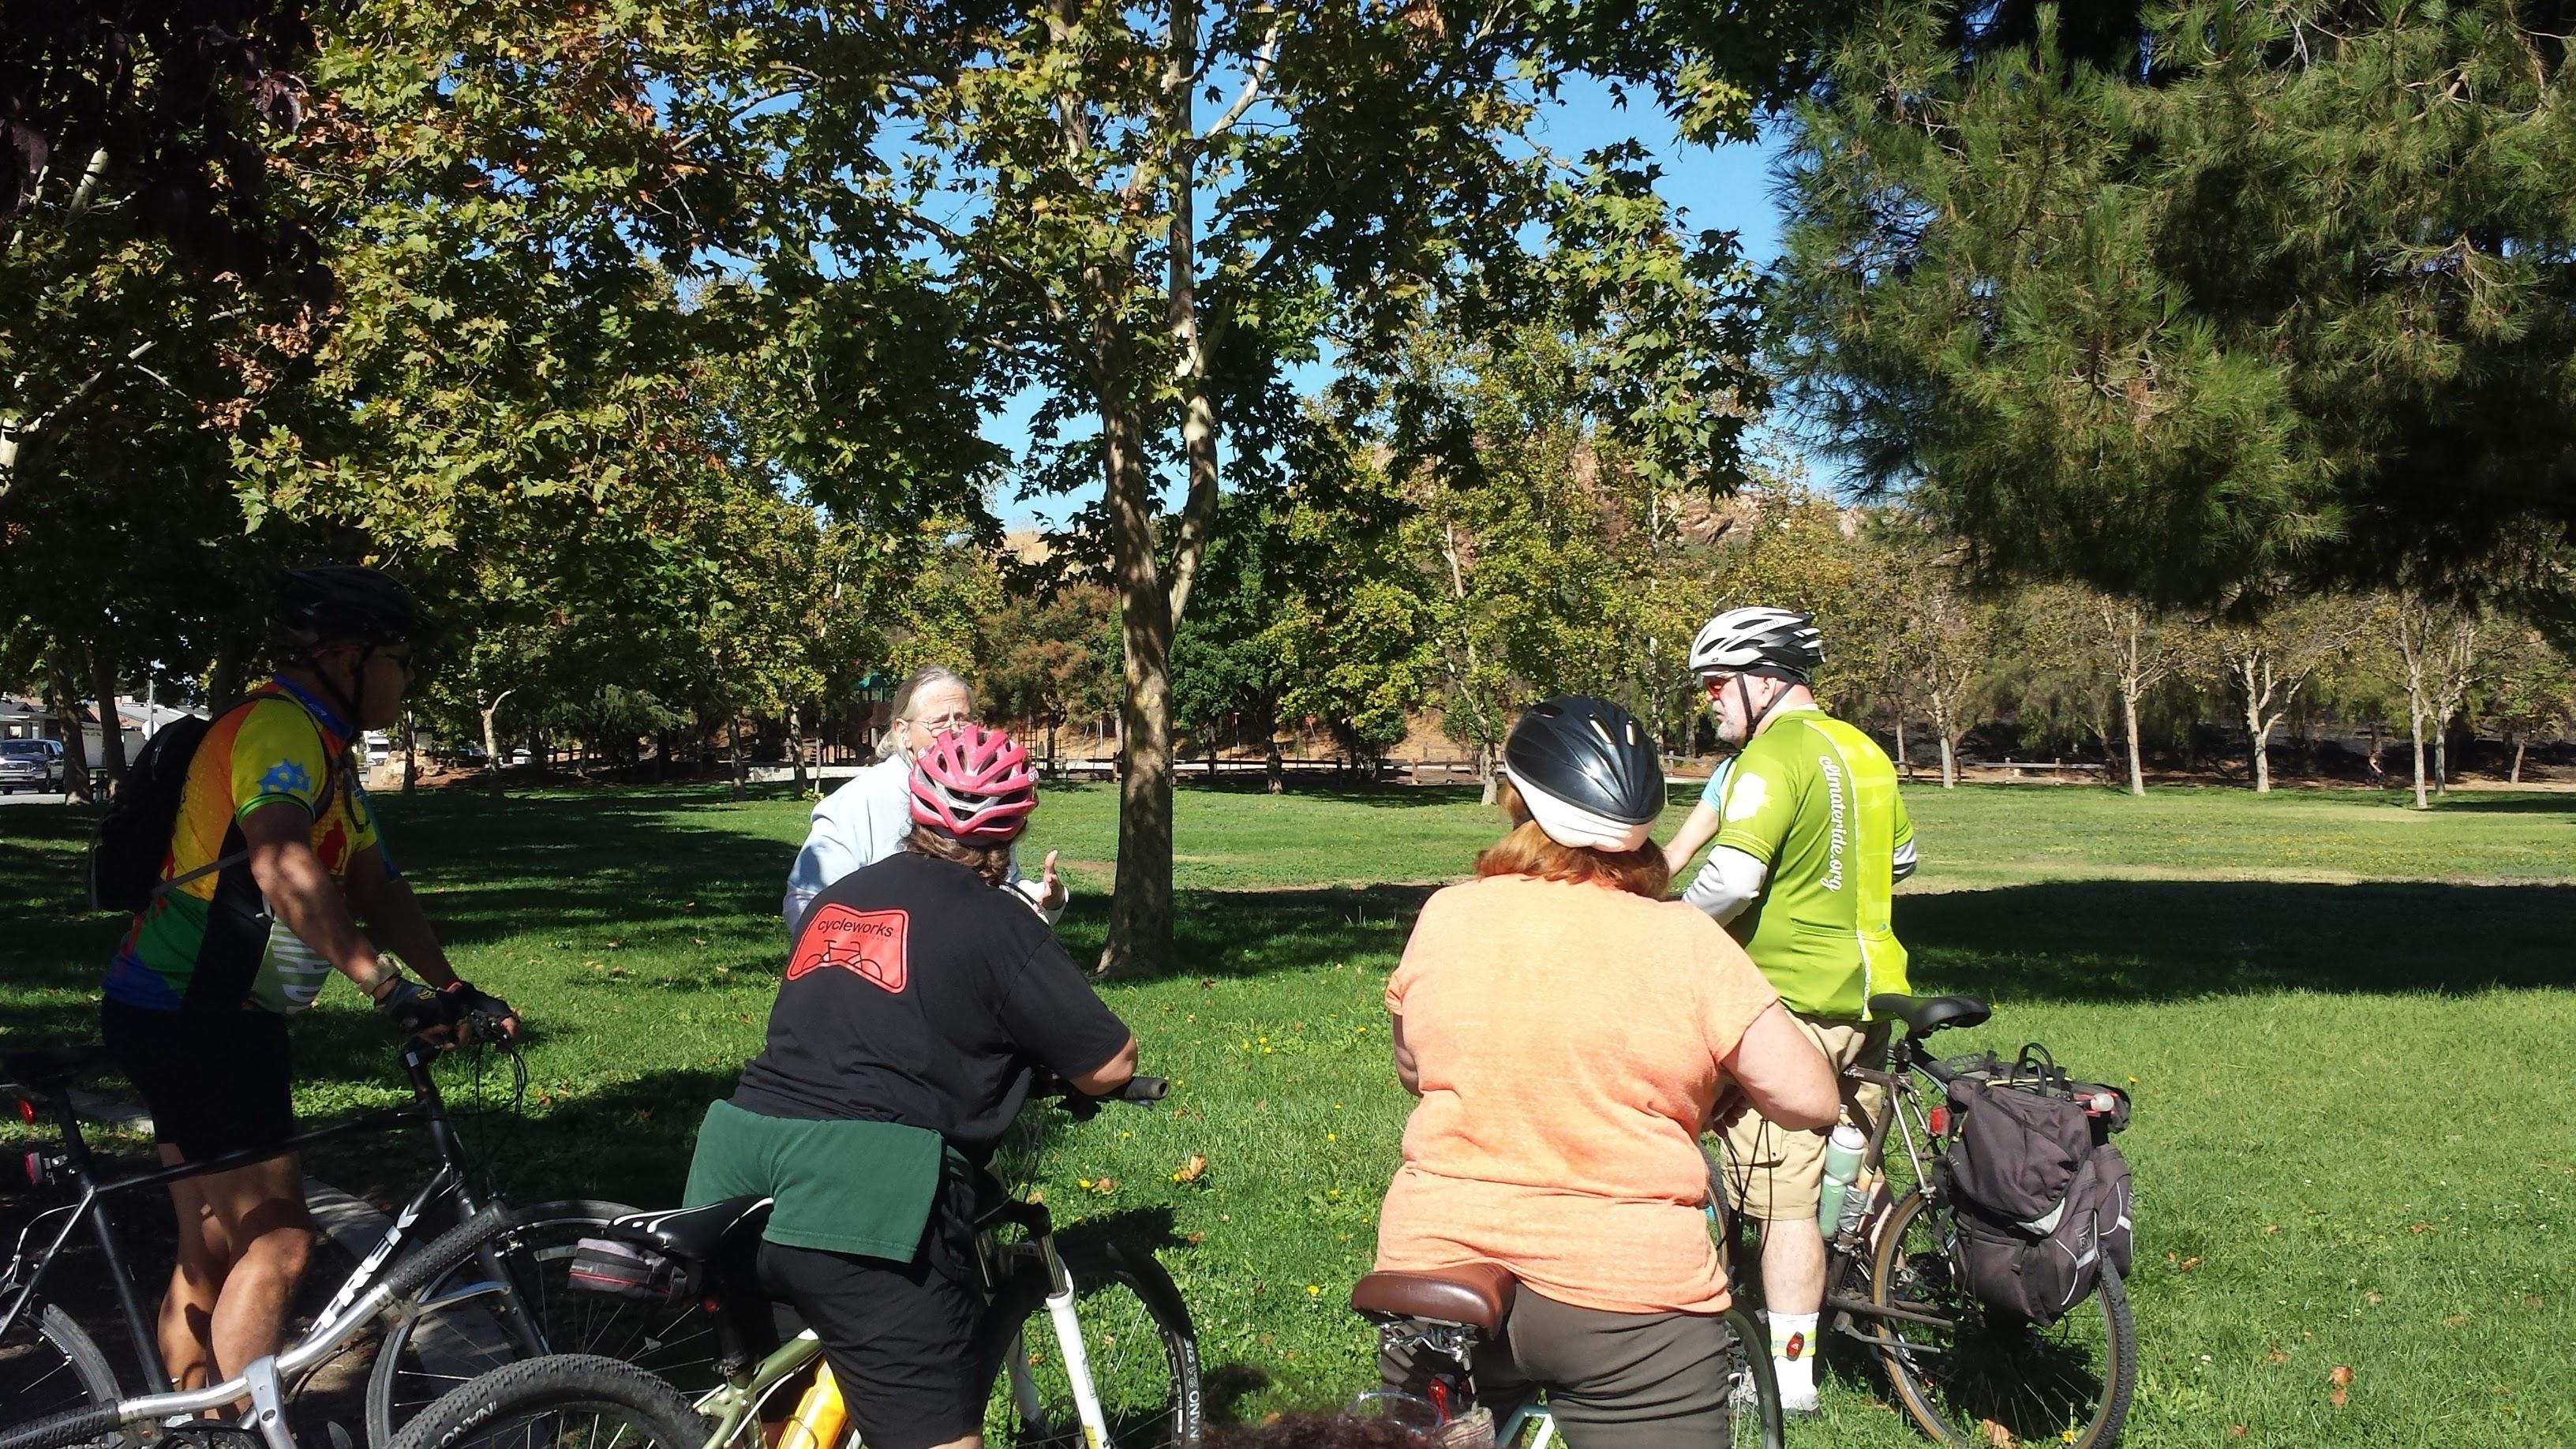 Jean Dresden leading a tour of a San Jose park.